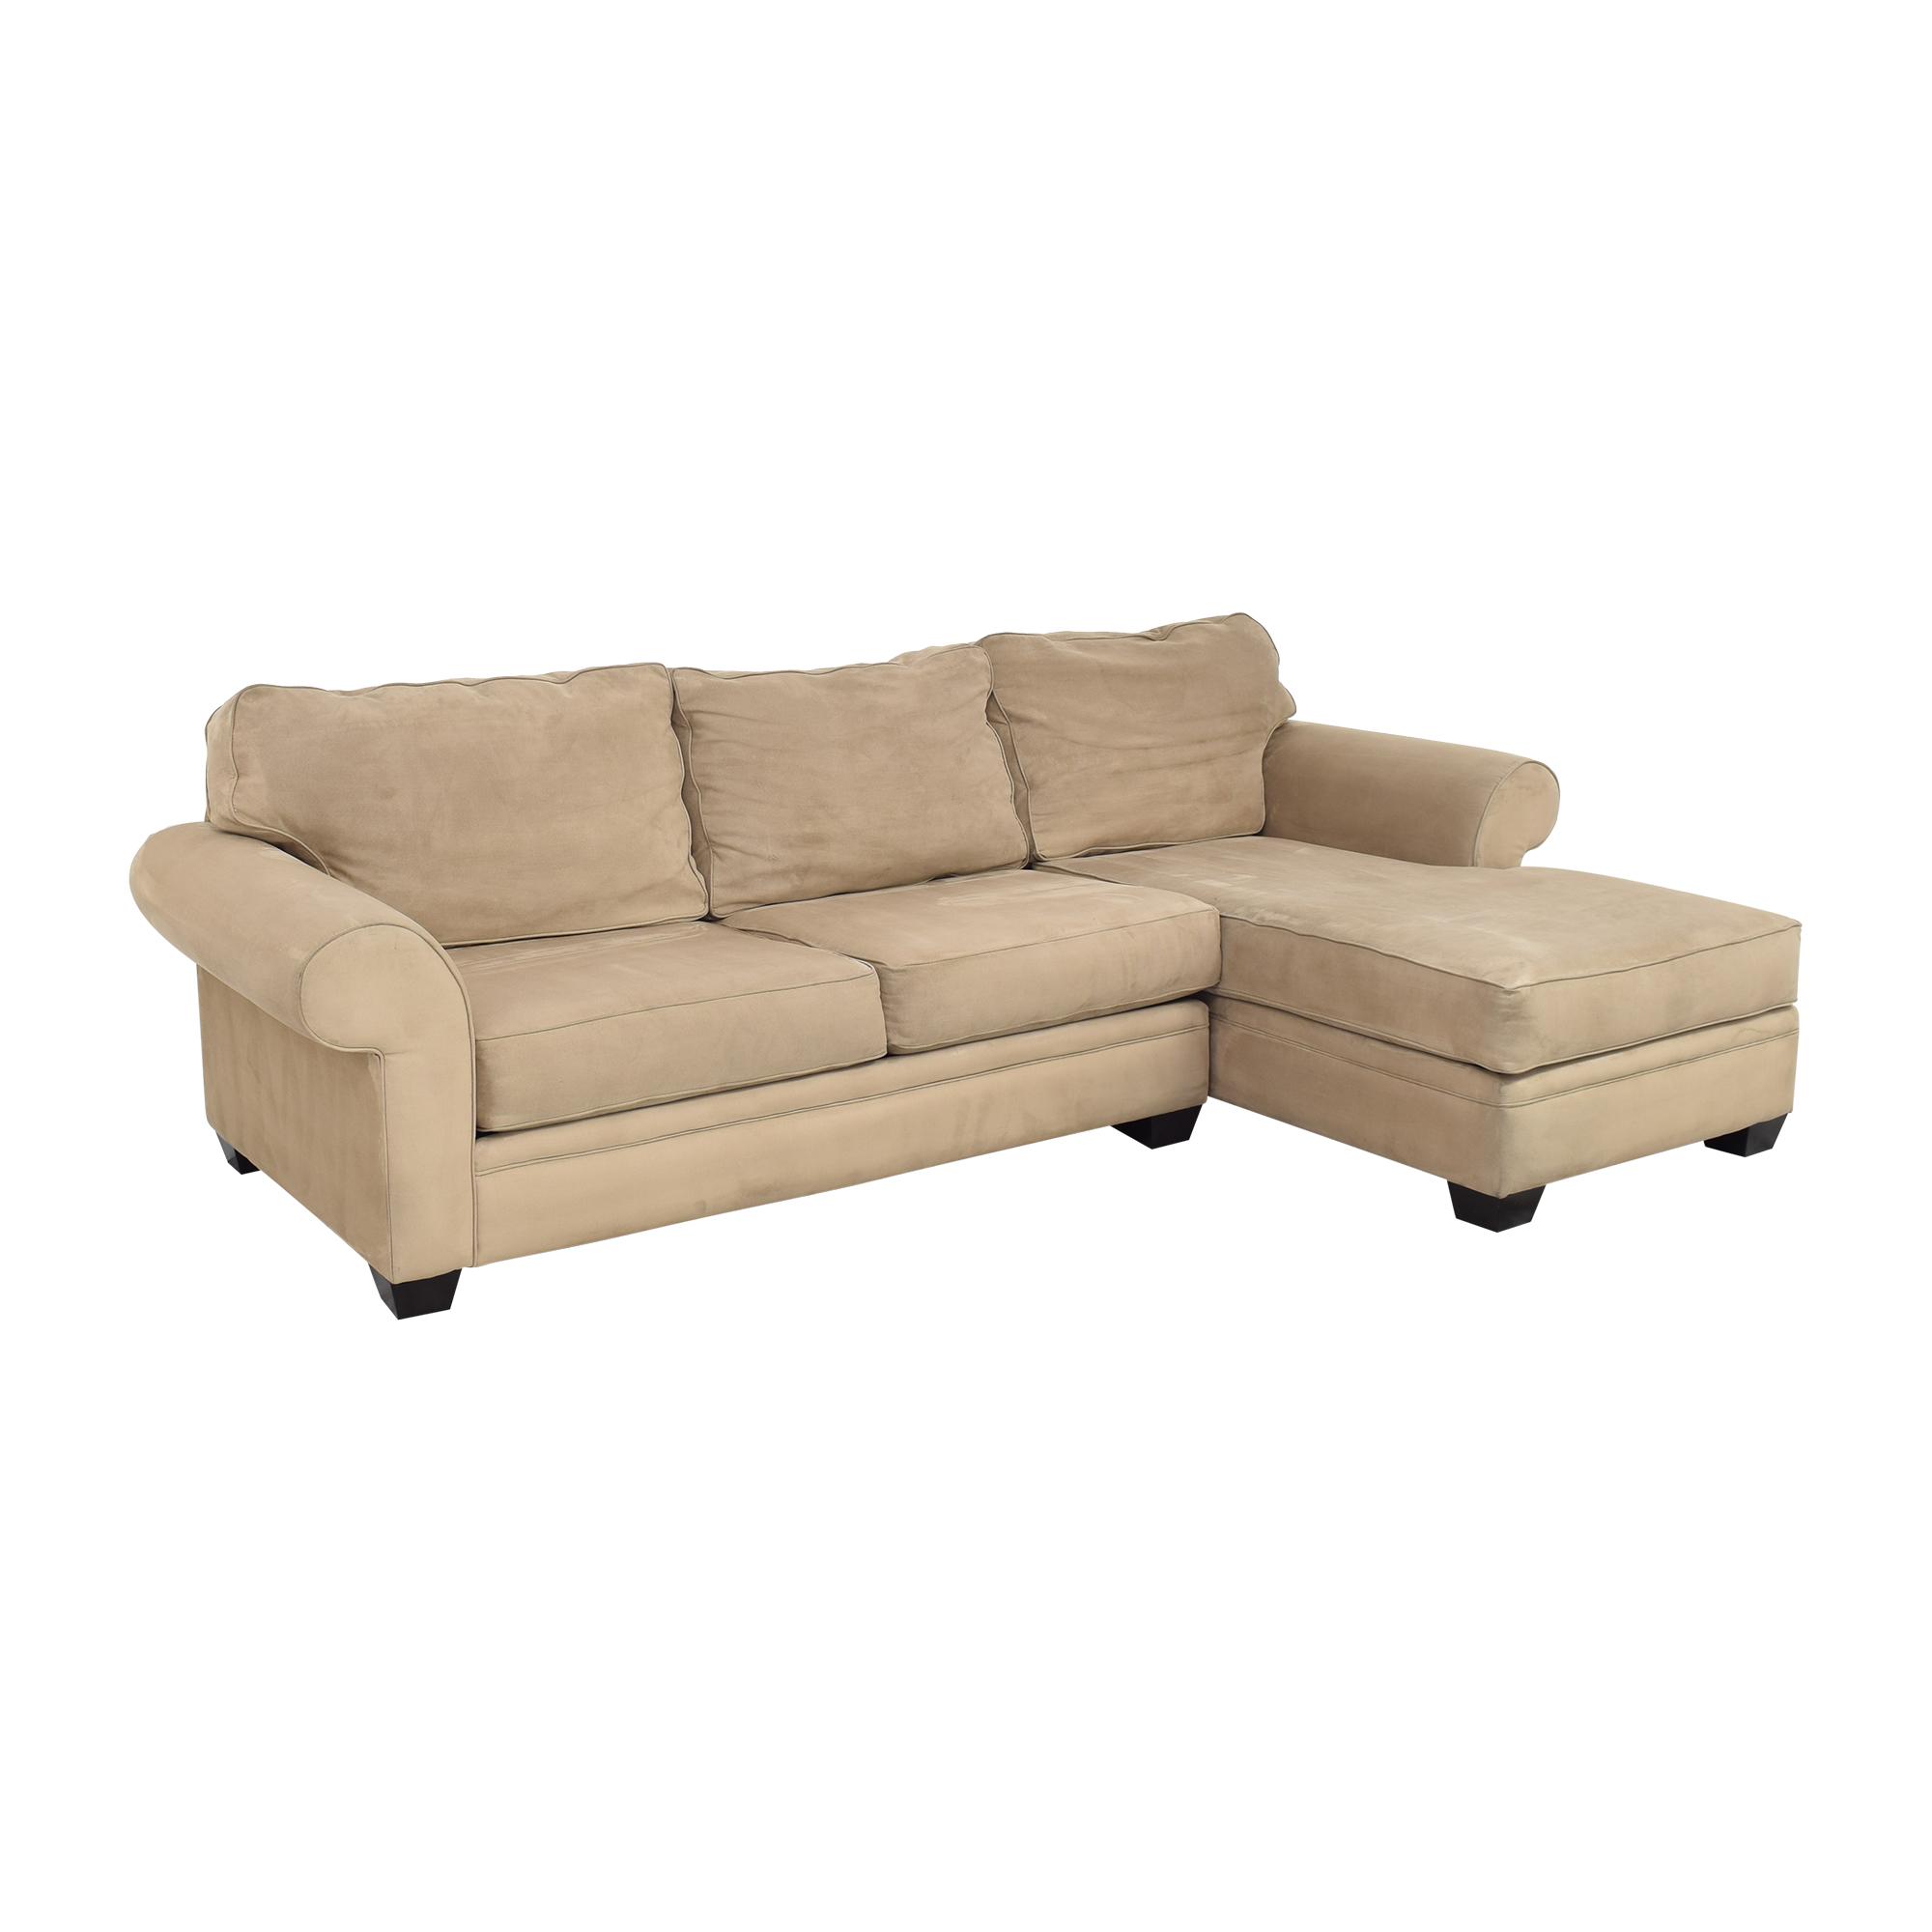 Jonathan Louis Chaise Sectional Sofa sale